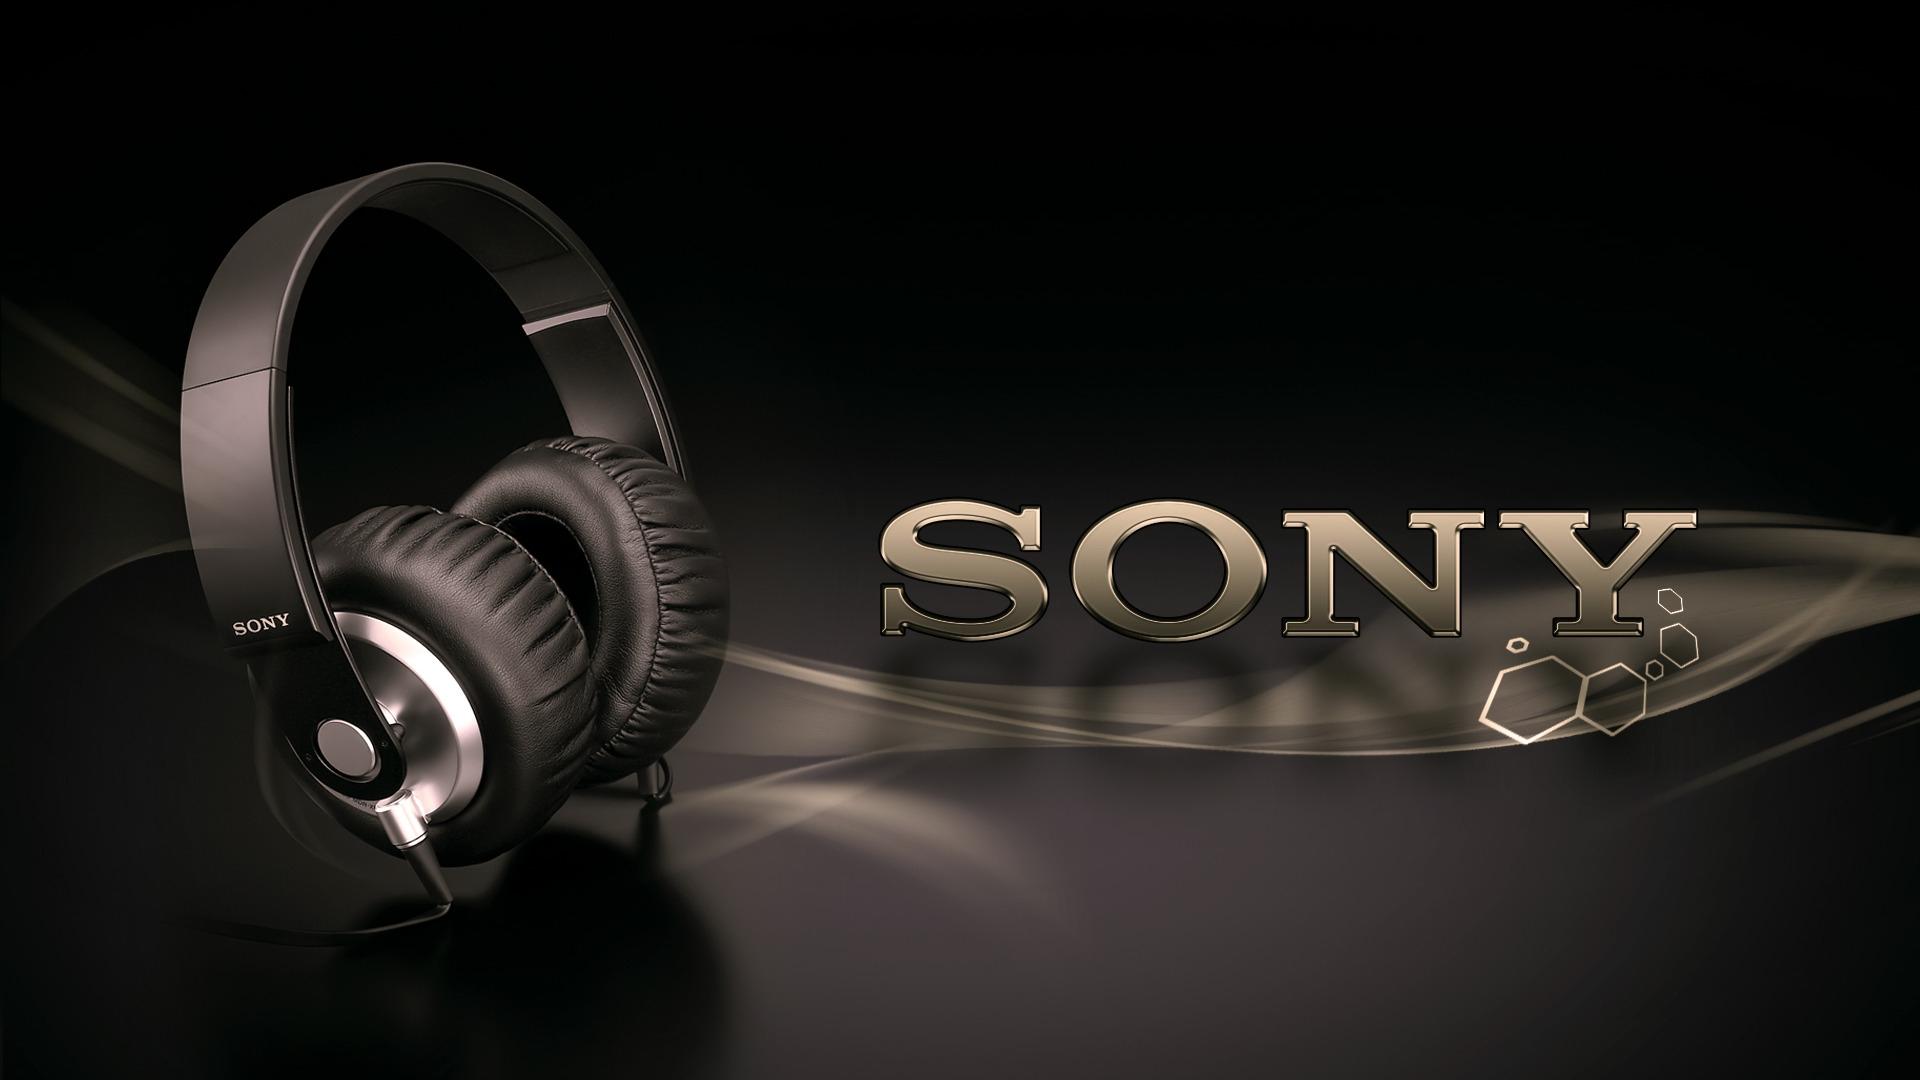 Cool Sony Wallpaper 23295 1680x1050 px